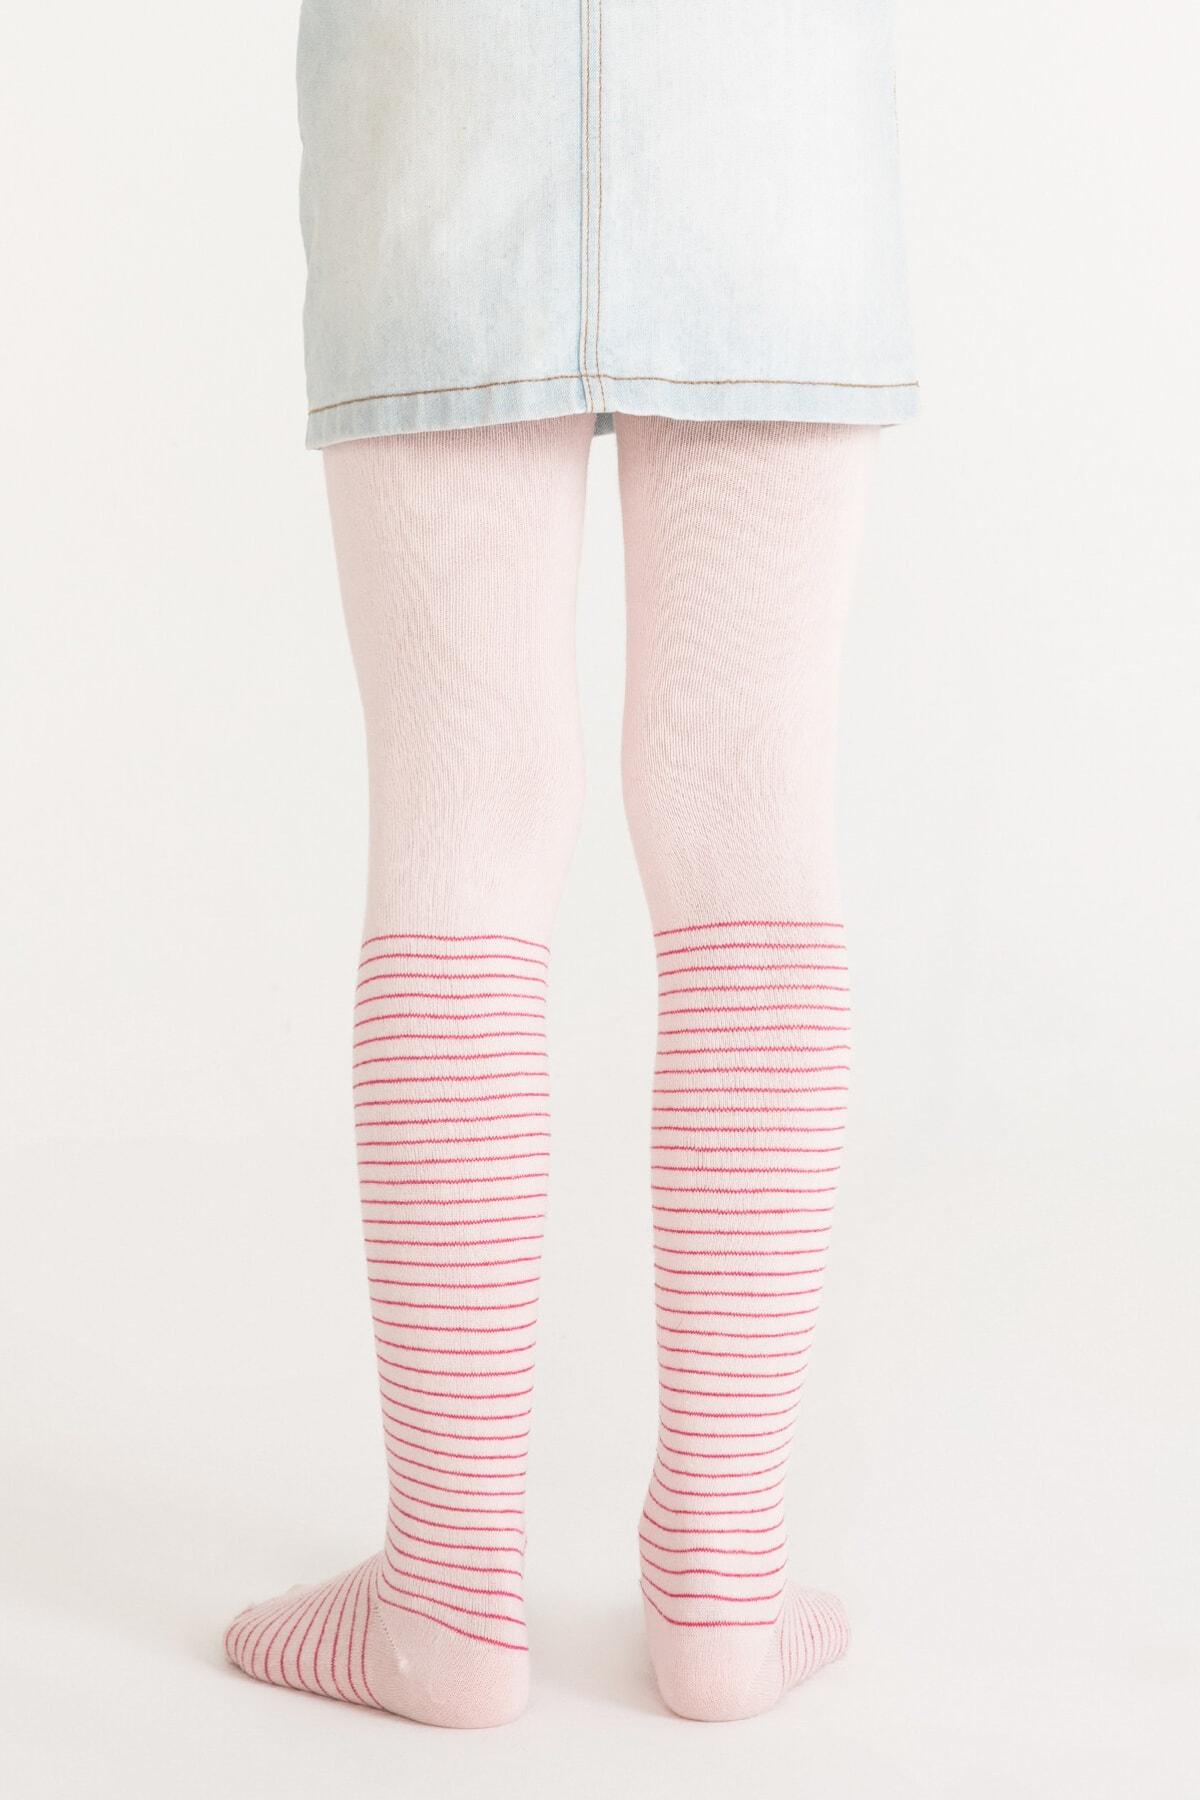 Penti Pembe Pretty Crystal Külotlu Çorap 2